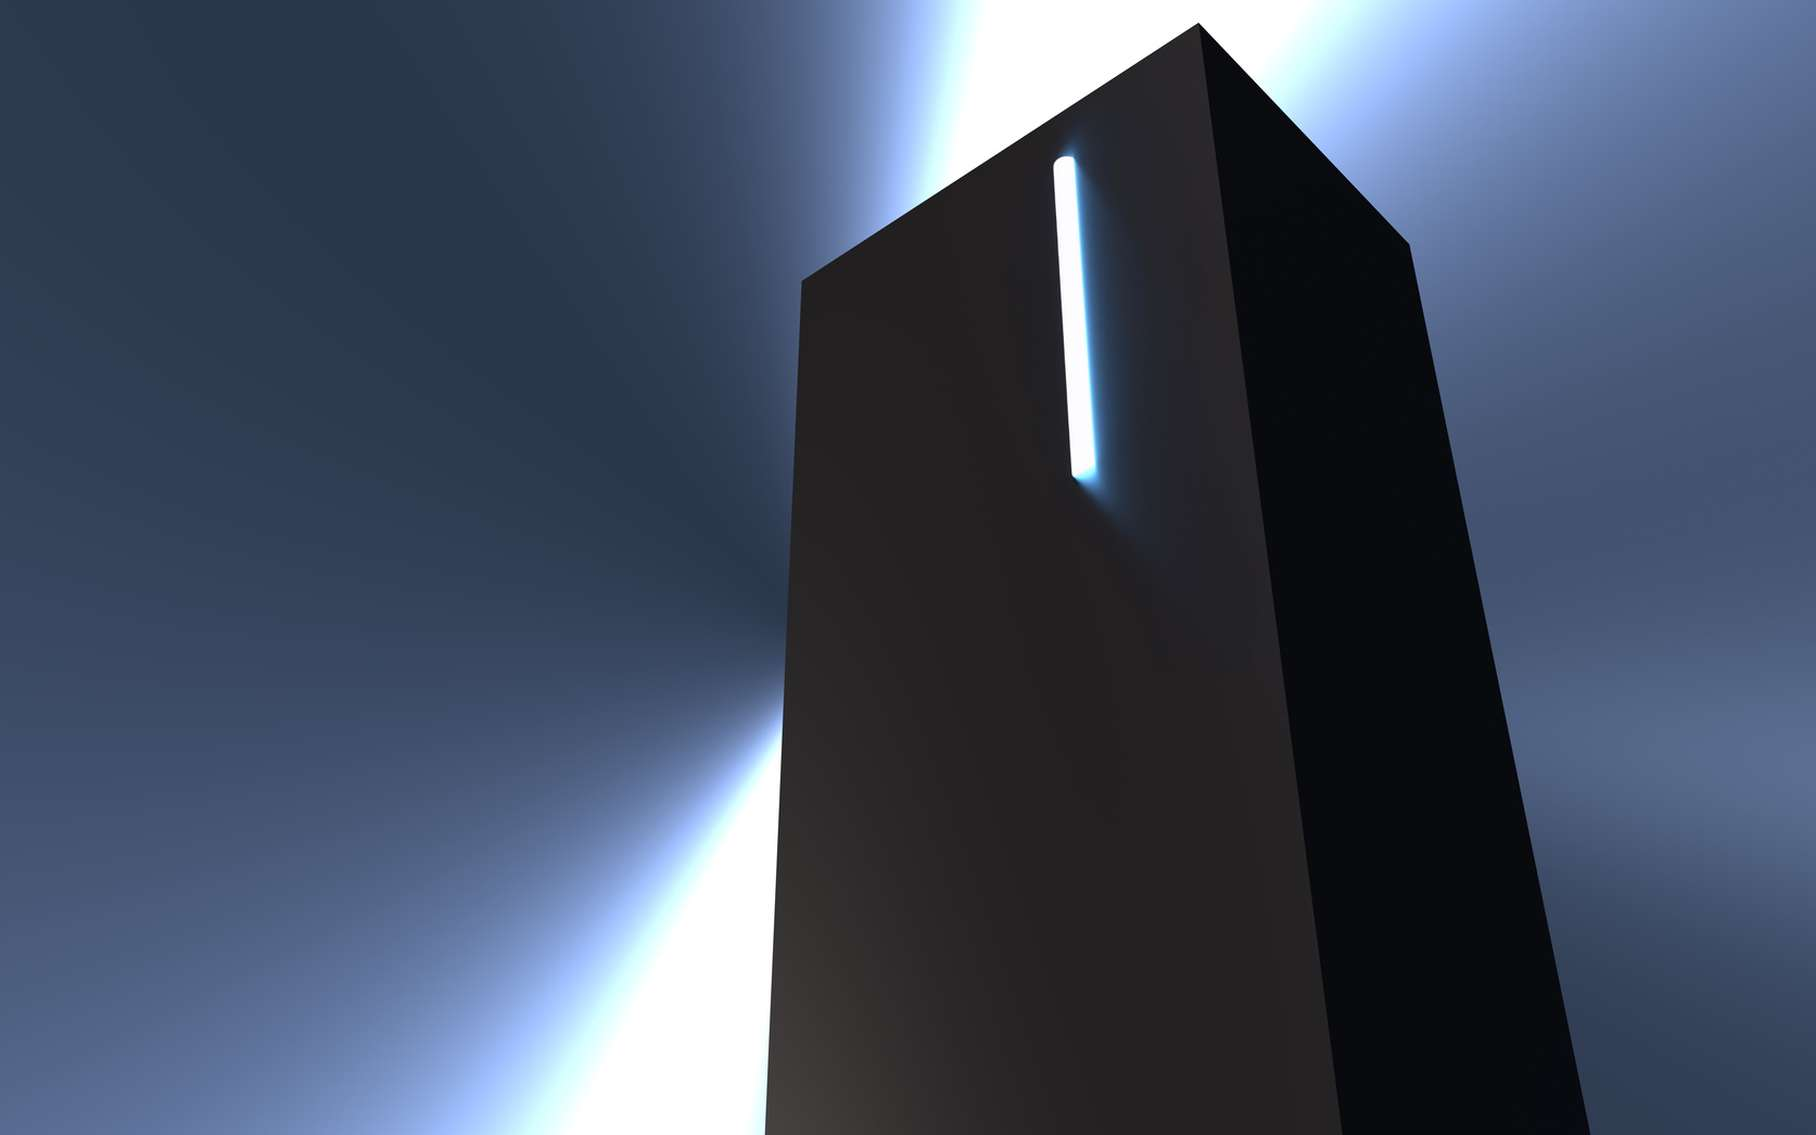 Les ordinateurs quantiques de demain ont encore des obstacles à franchir. © Fotostar, Fotolia